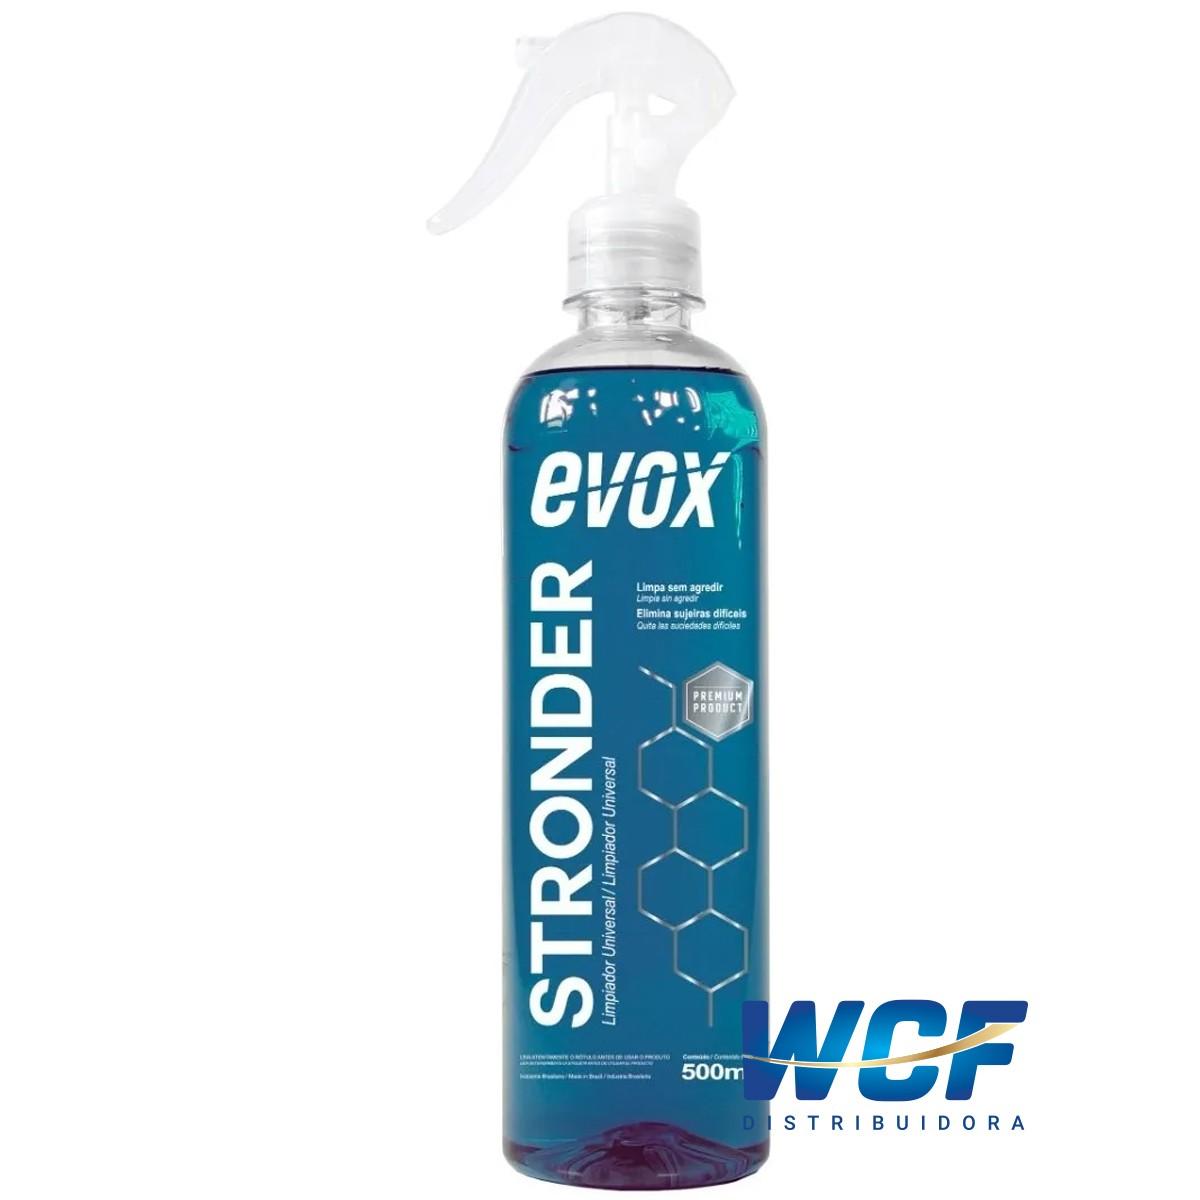 APC STRONDER 500ML EVOX